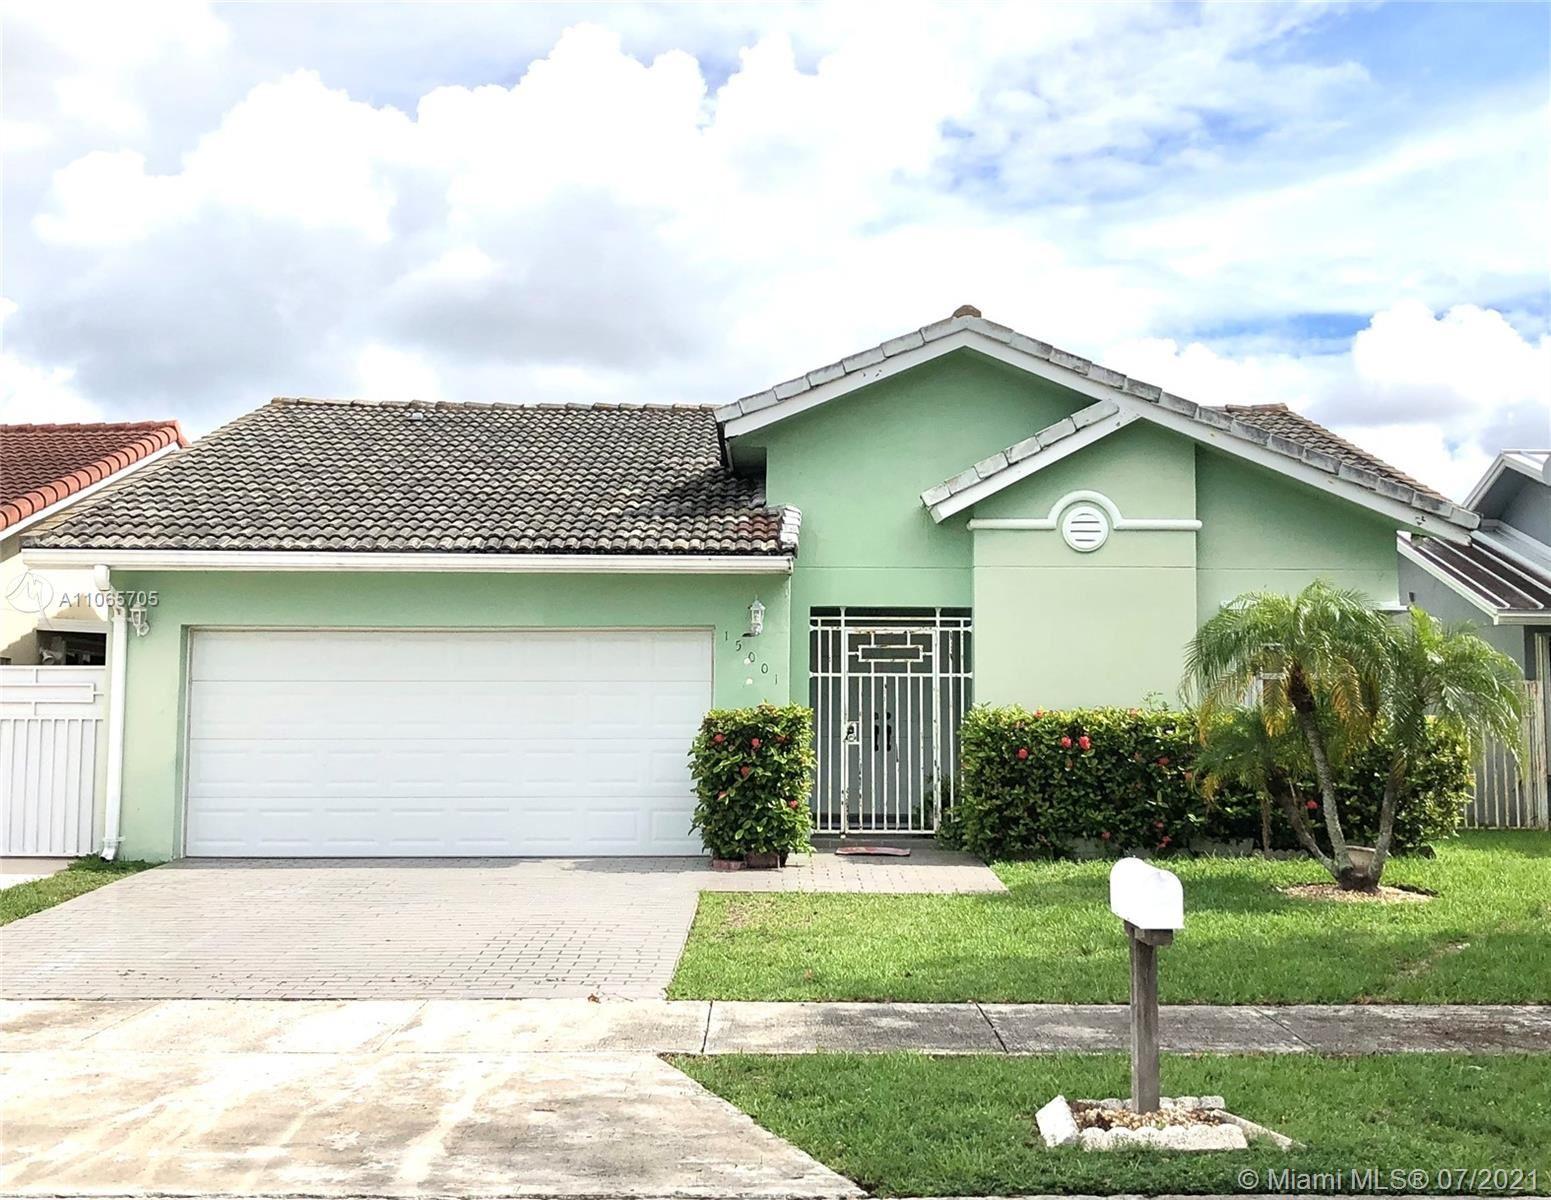 15001 SW 63rd St, Miami, FL 33193 - #: A11065705